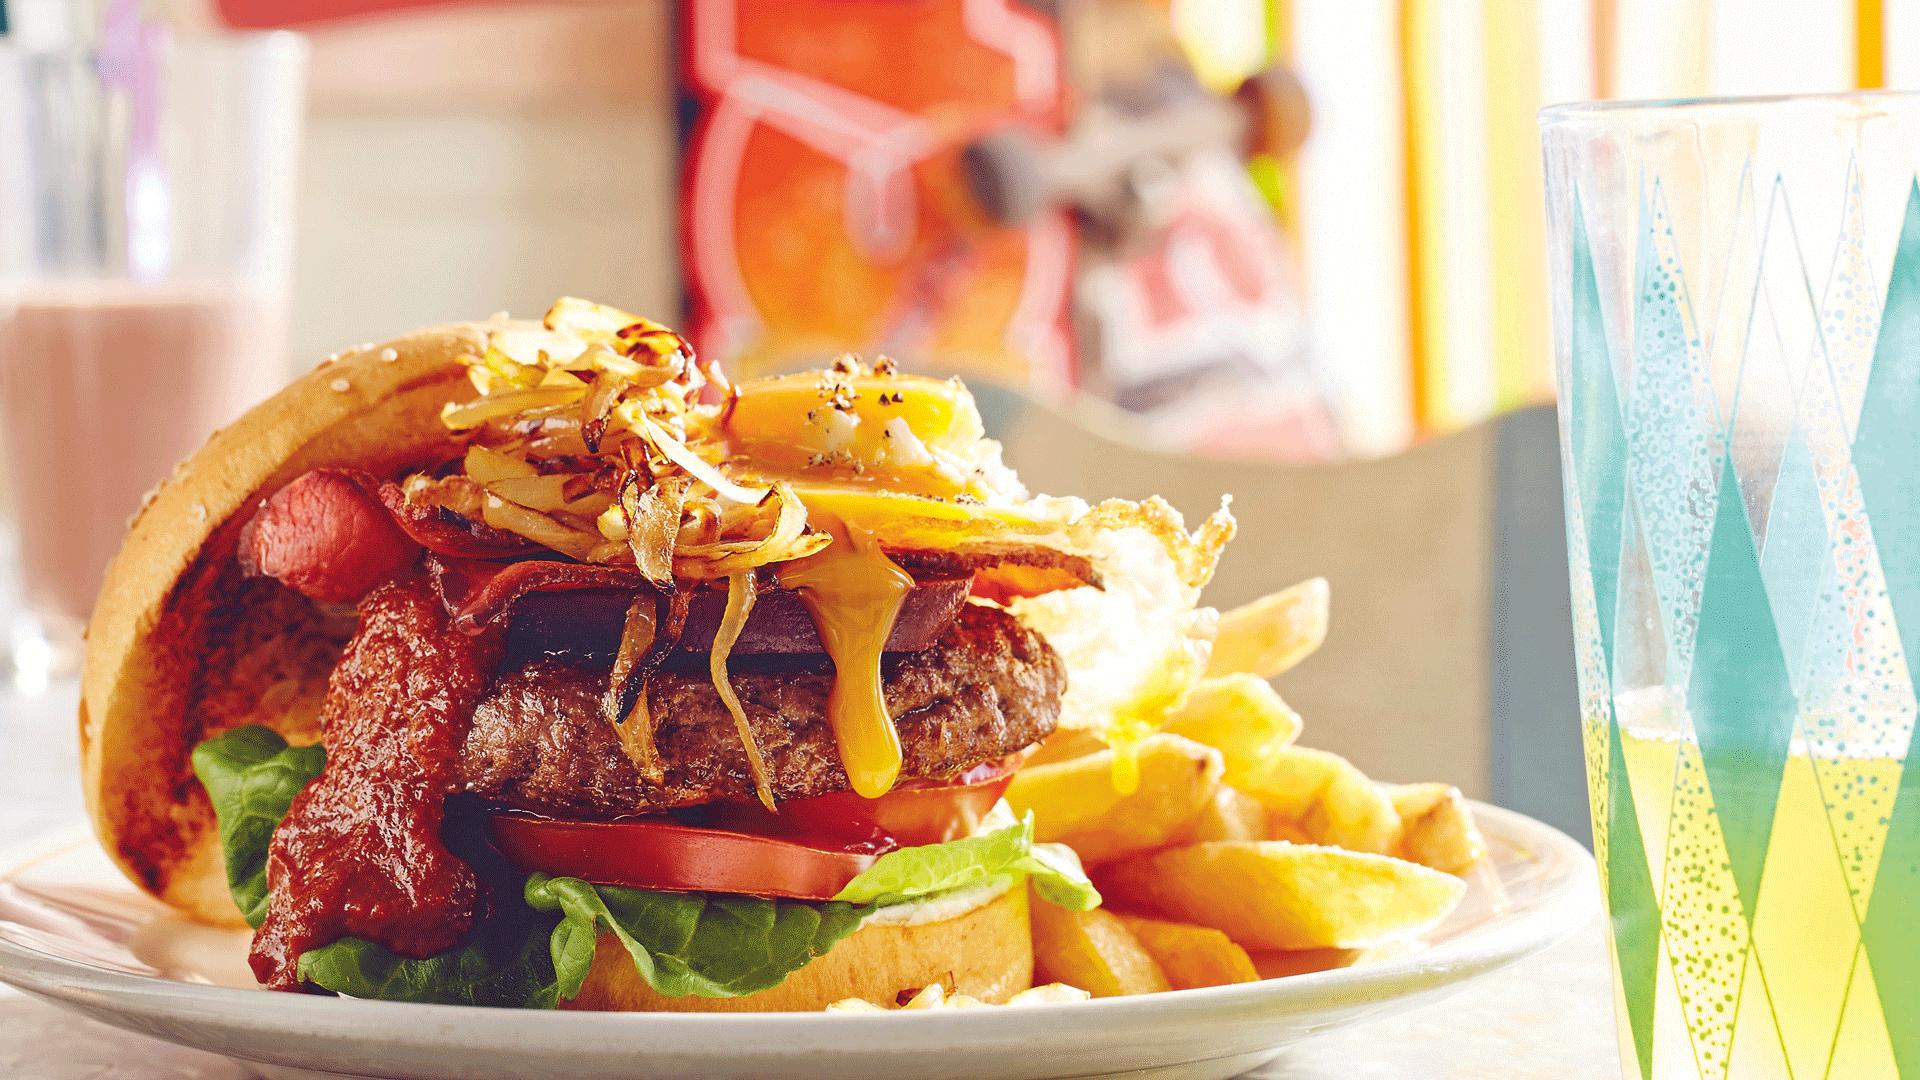 Milkbar Memories + Burger With 'The Lot'